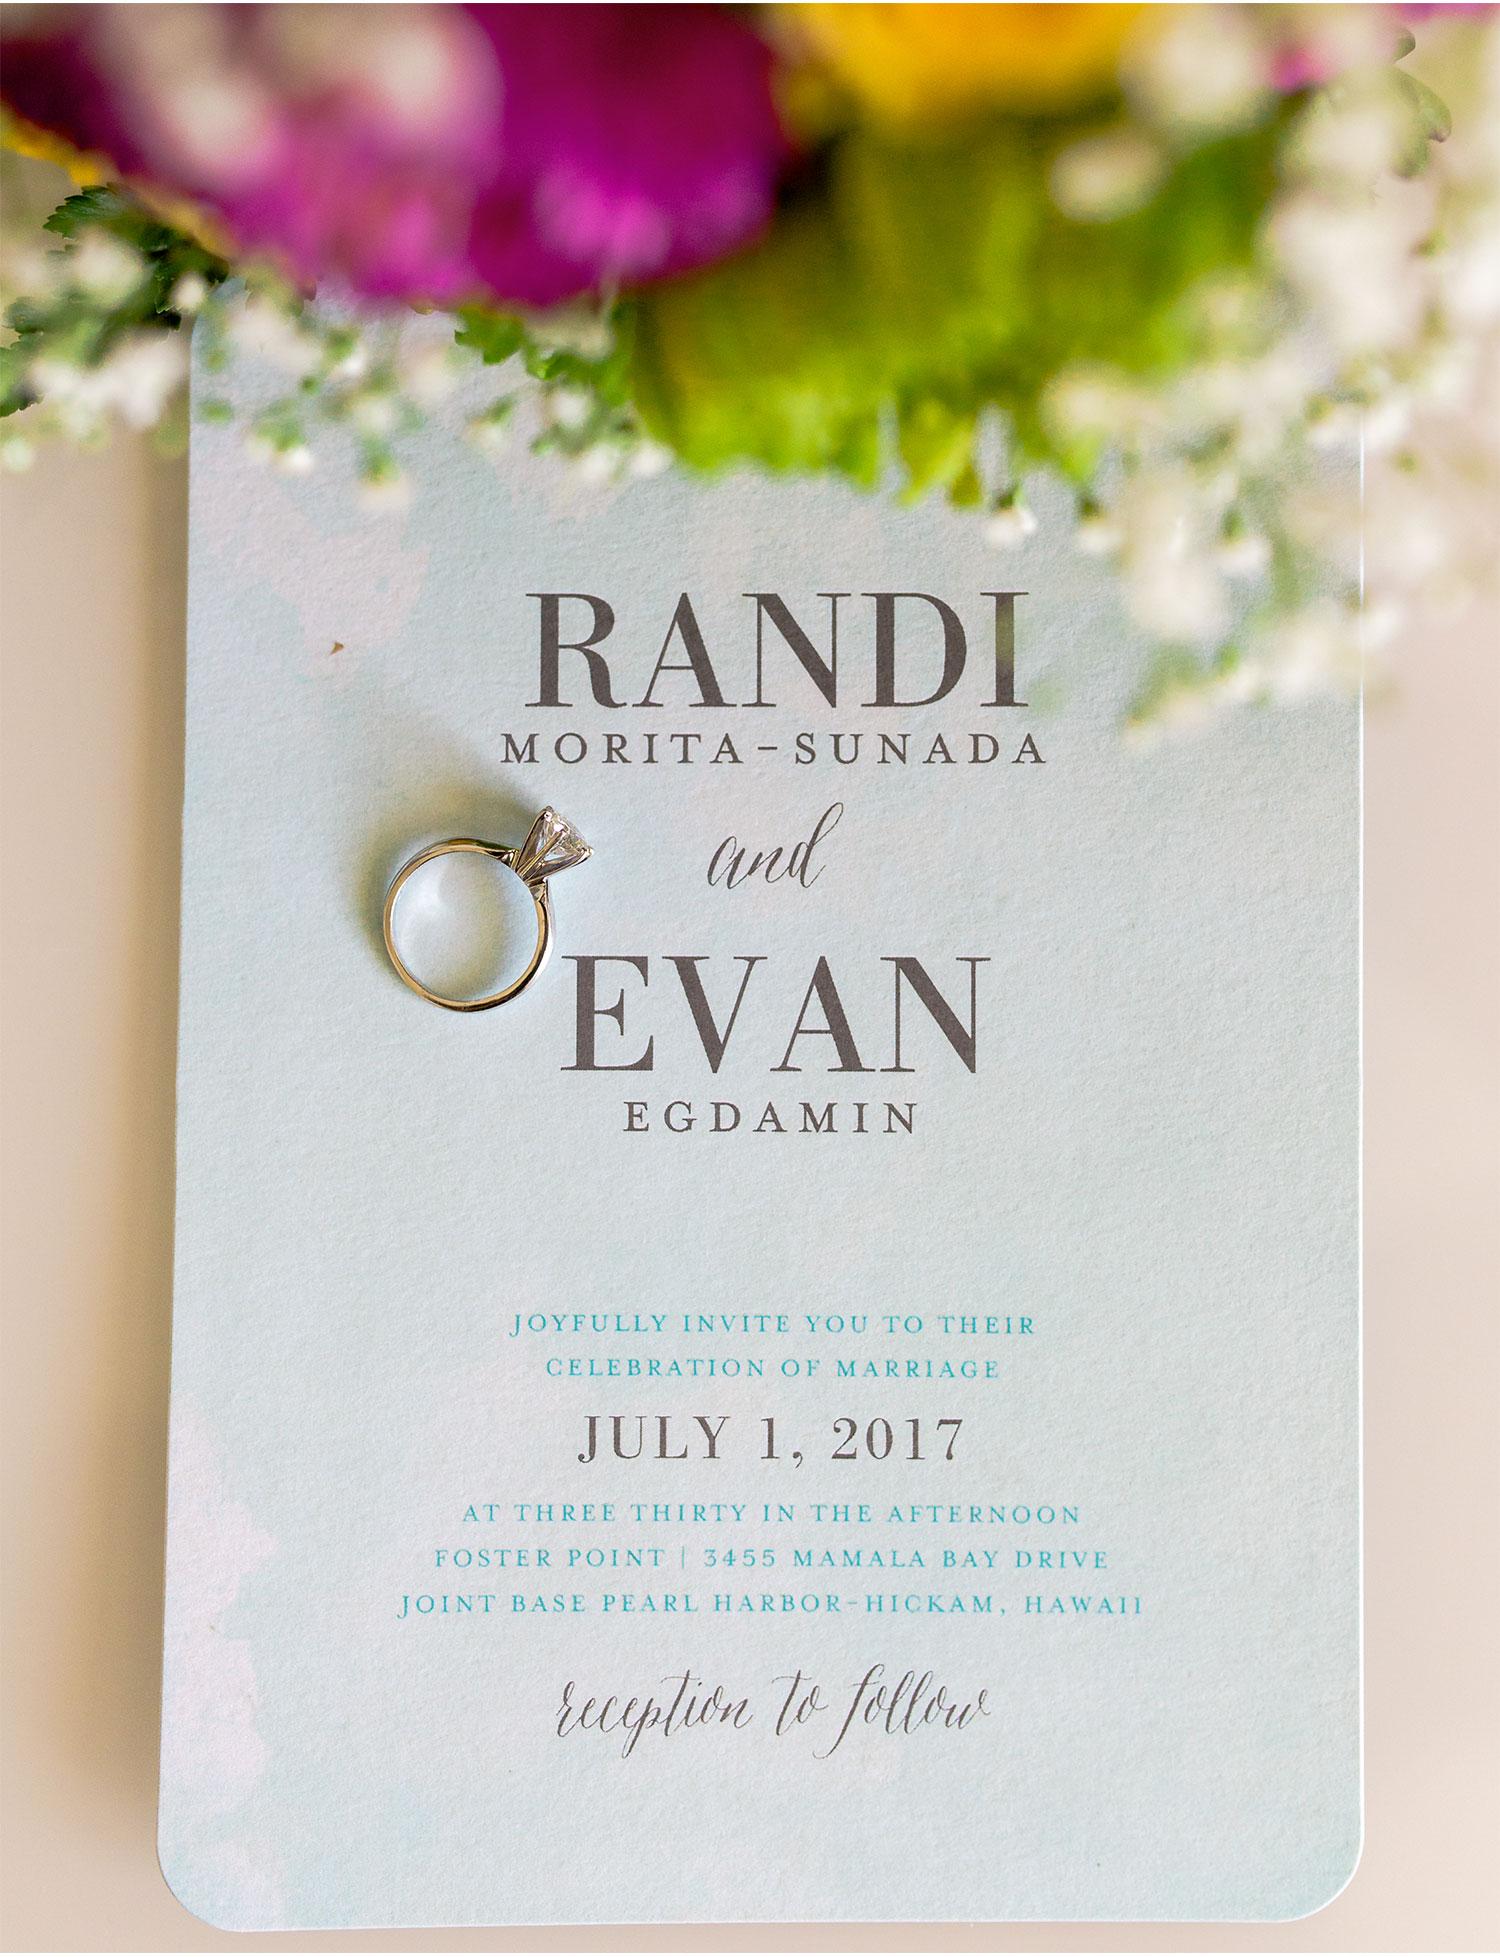 OA_-_Randi_+_Evan_02.jpg